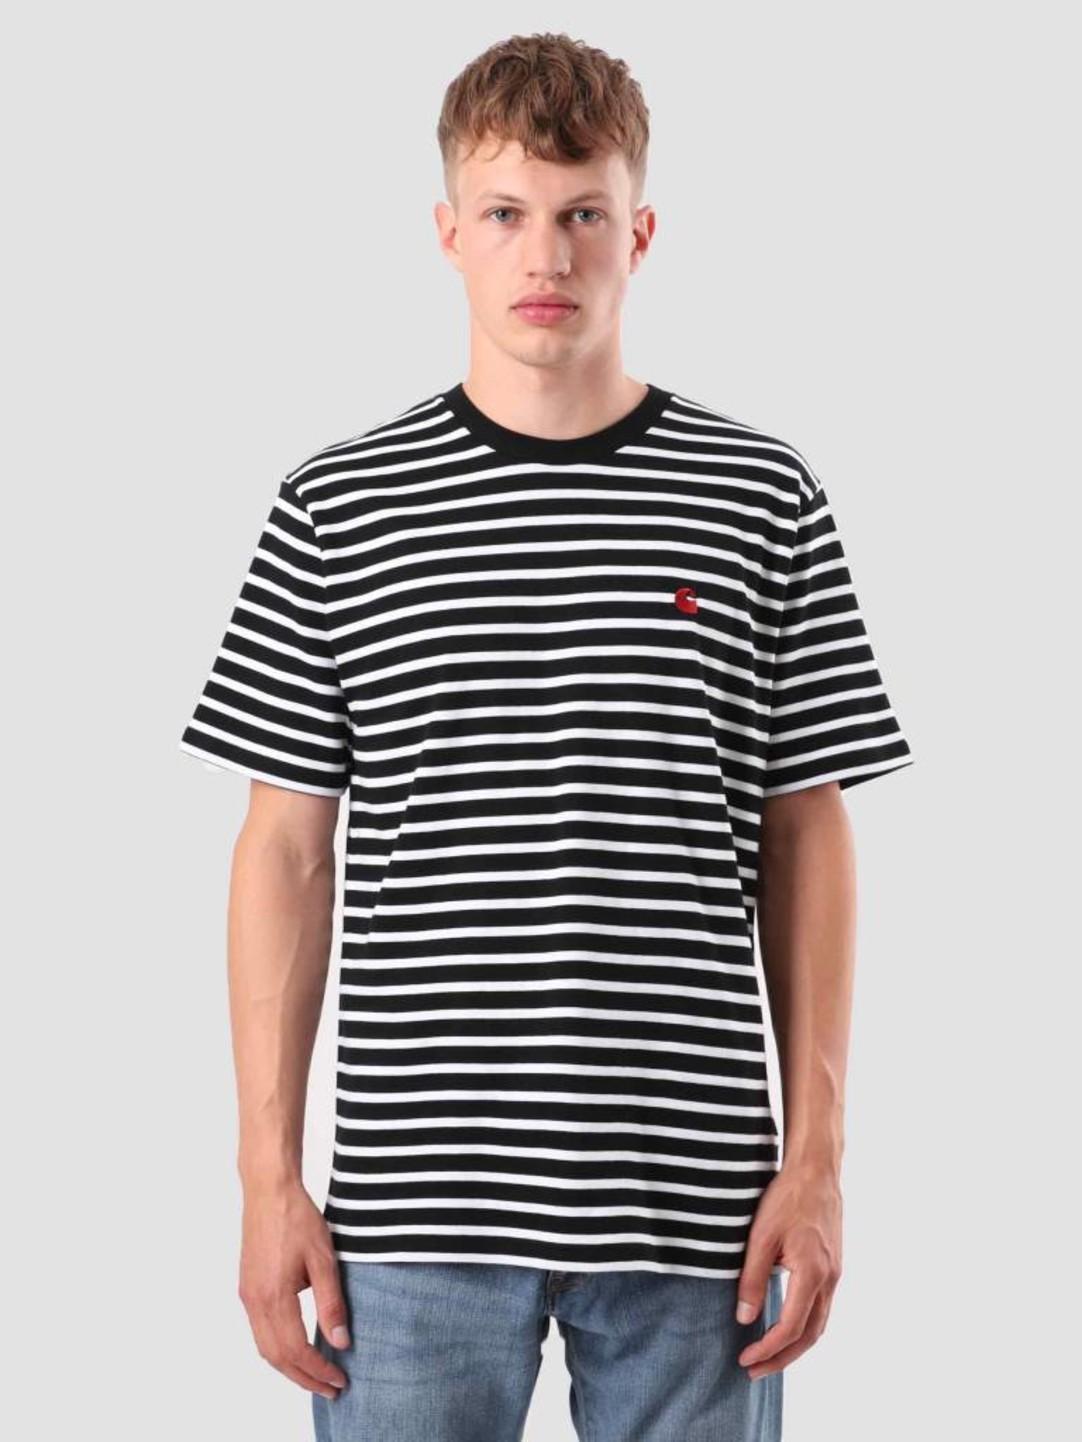 Carhartt WIP Carhartt WIP Robie T-Shirt Stripe Black White Blast Red I022004-8991